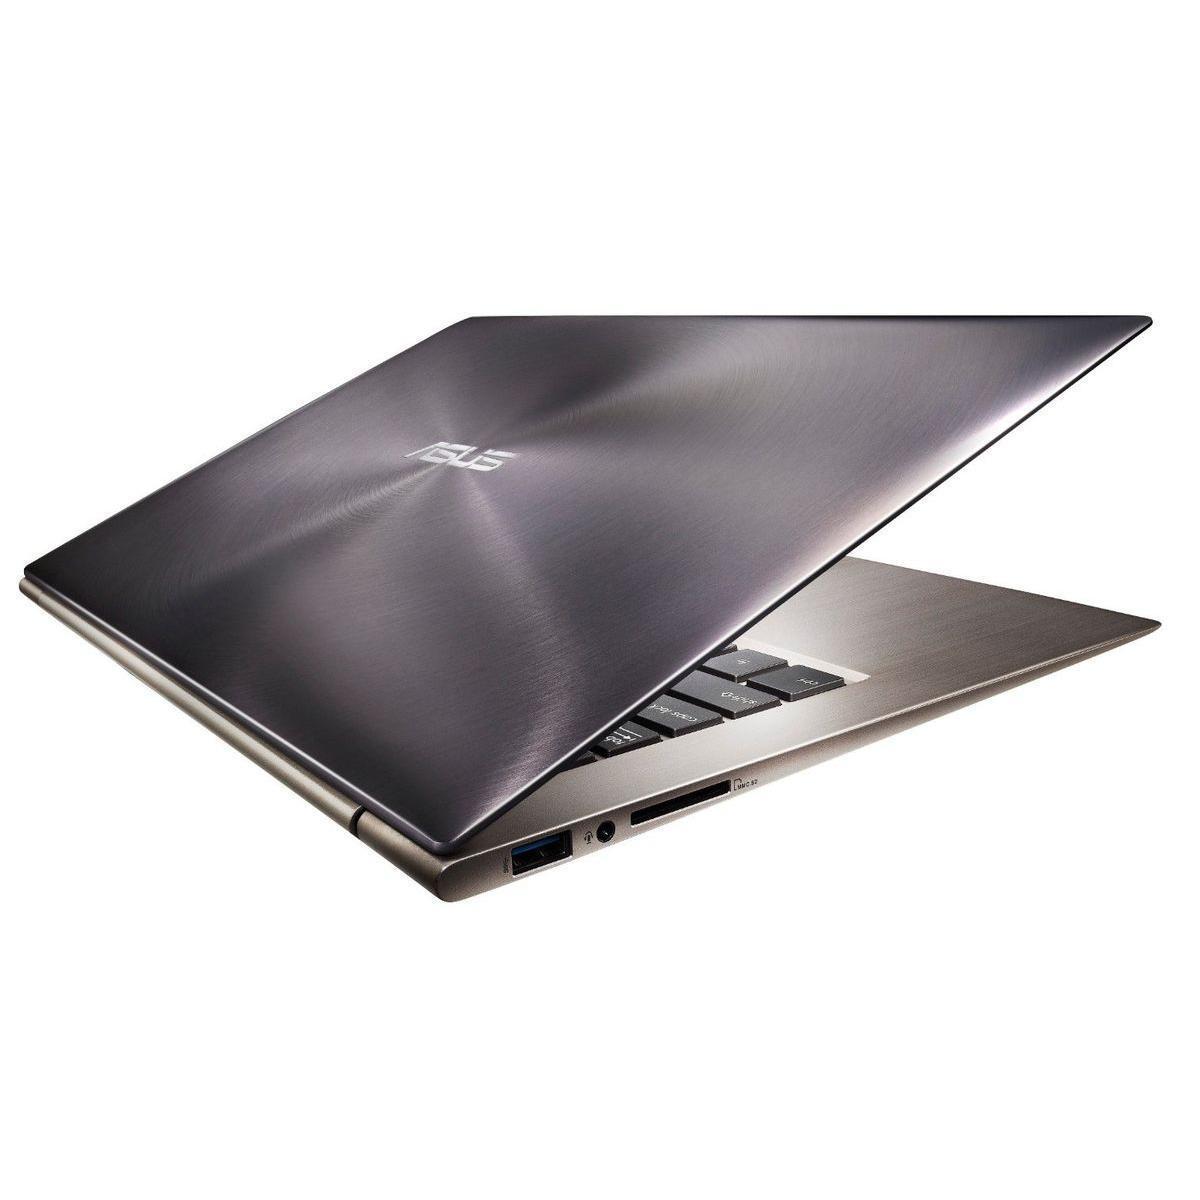 "Asus UX32VD-R3001H 13,3"" Core i5 1,7 GHz  - SSD 24 Go + HDD 1 To - RAM 4 Go"